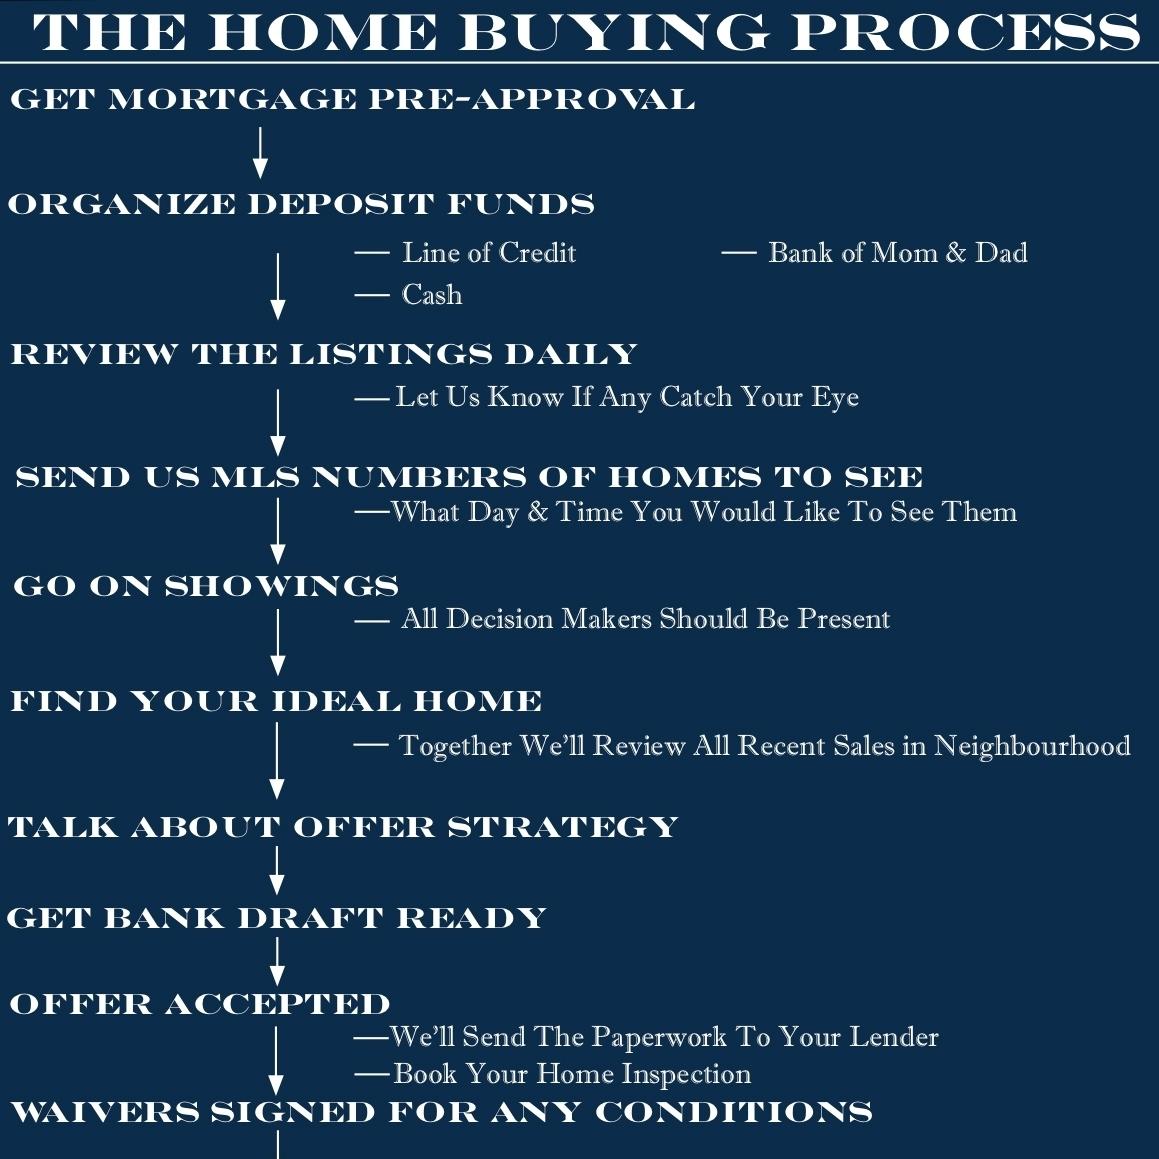 MASTER - Buying Process Flow Chart.jpg